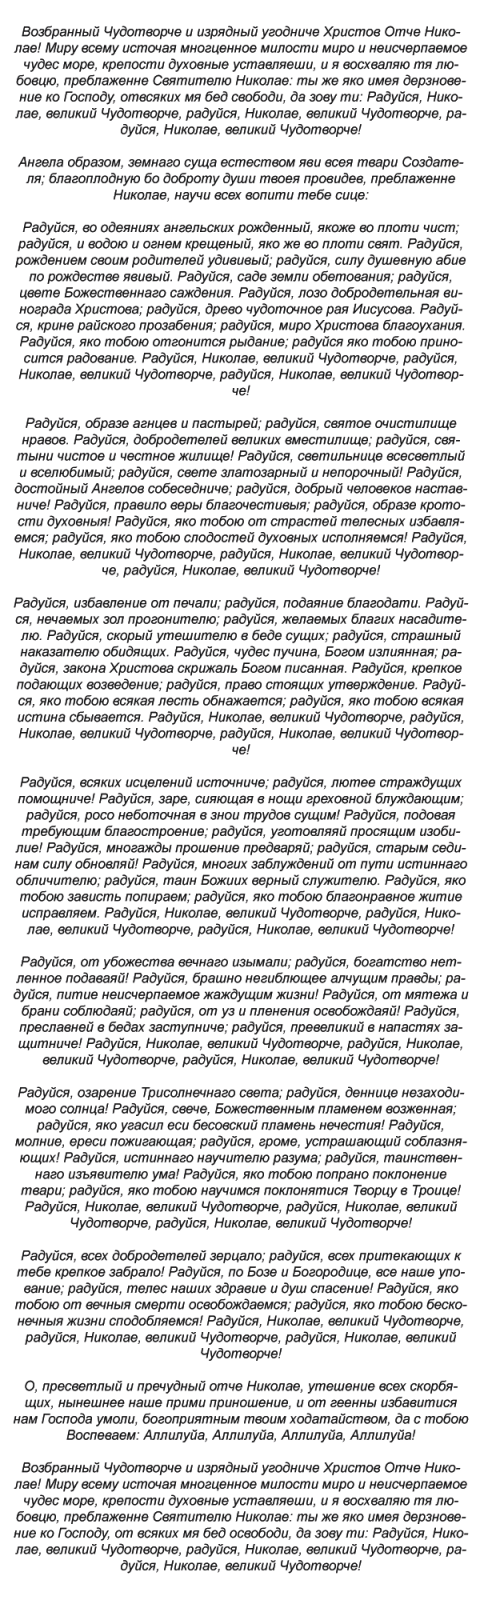 Молитва Николаю Чудотворцу 23j1lli